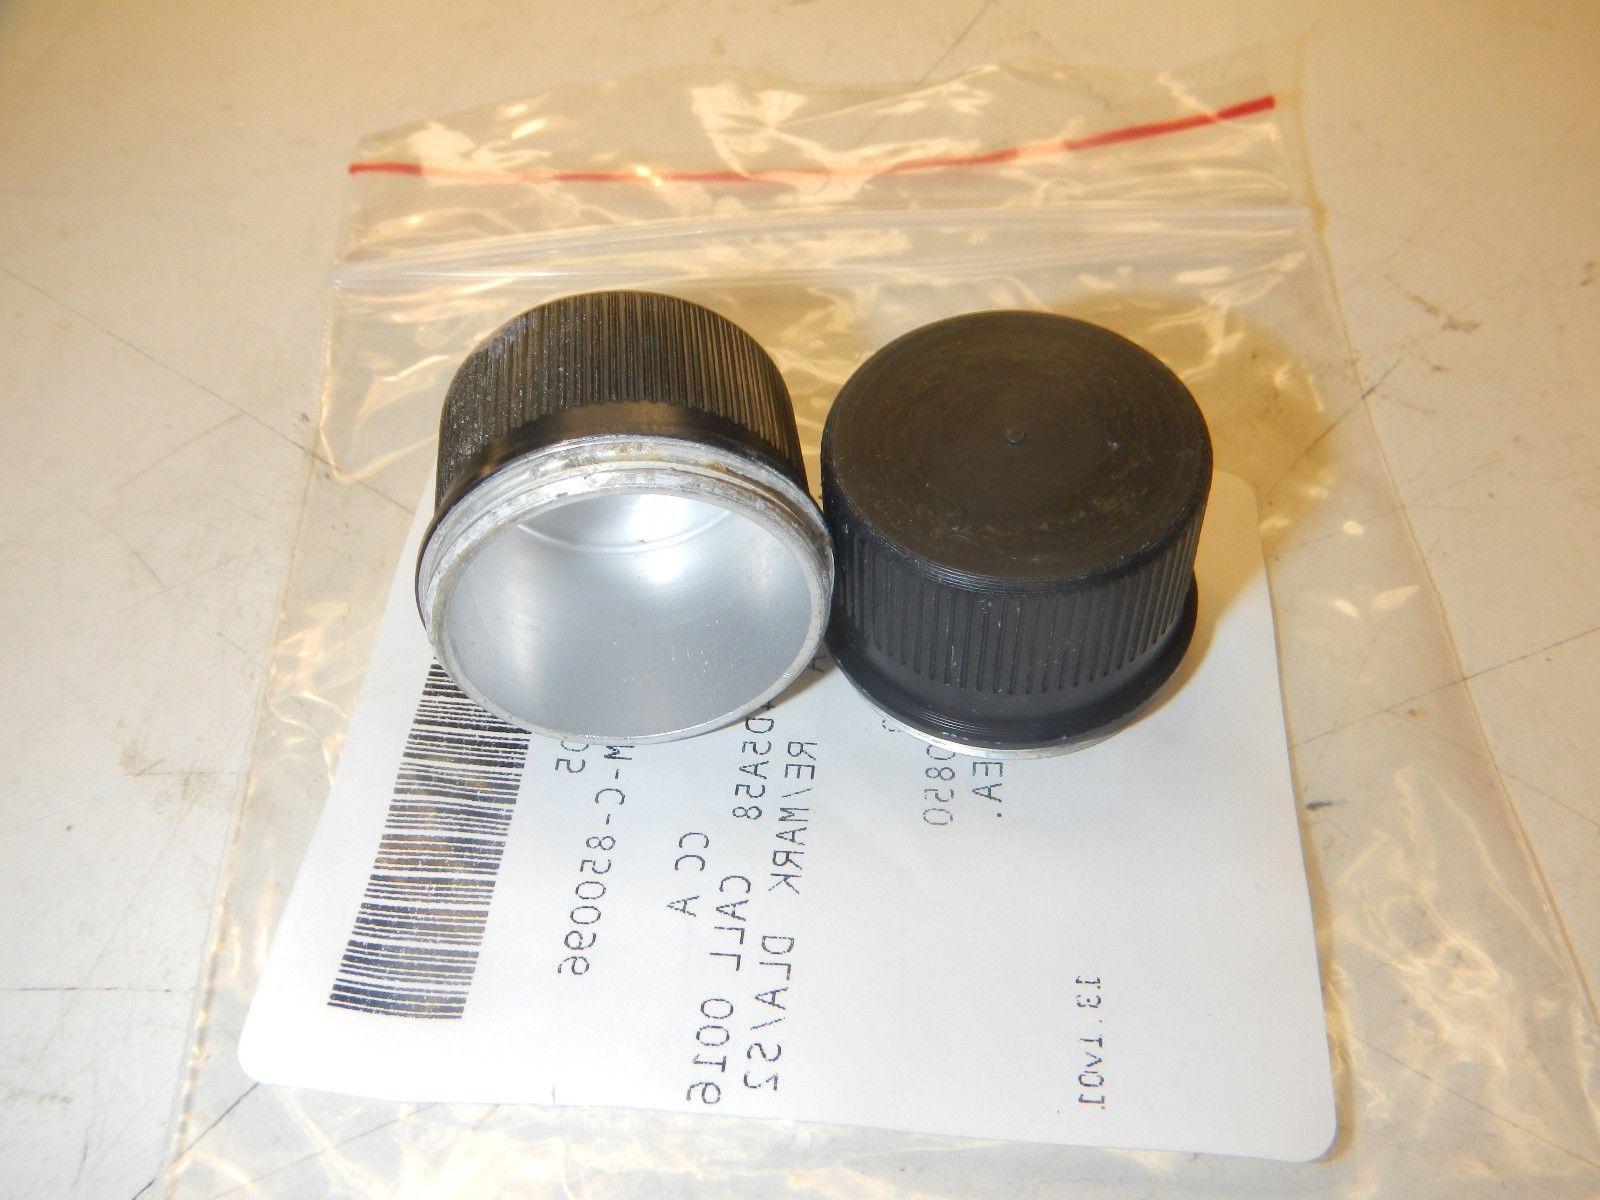 QTY 2 NEW AN/PVS-4 AN/TVS-5 Battery Cover Night Vision